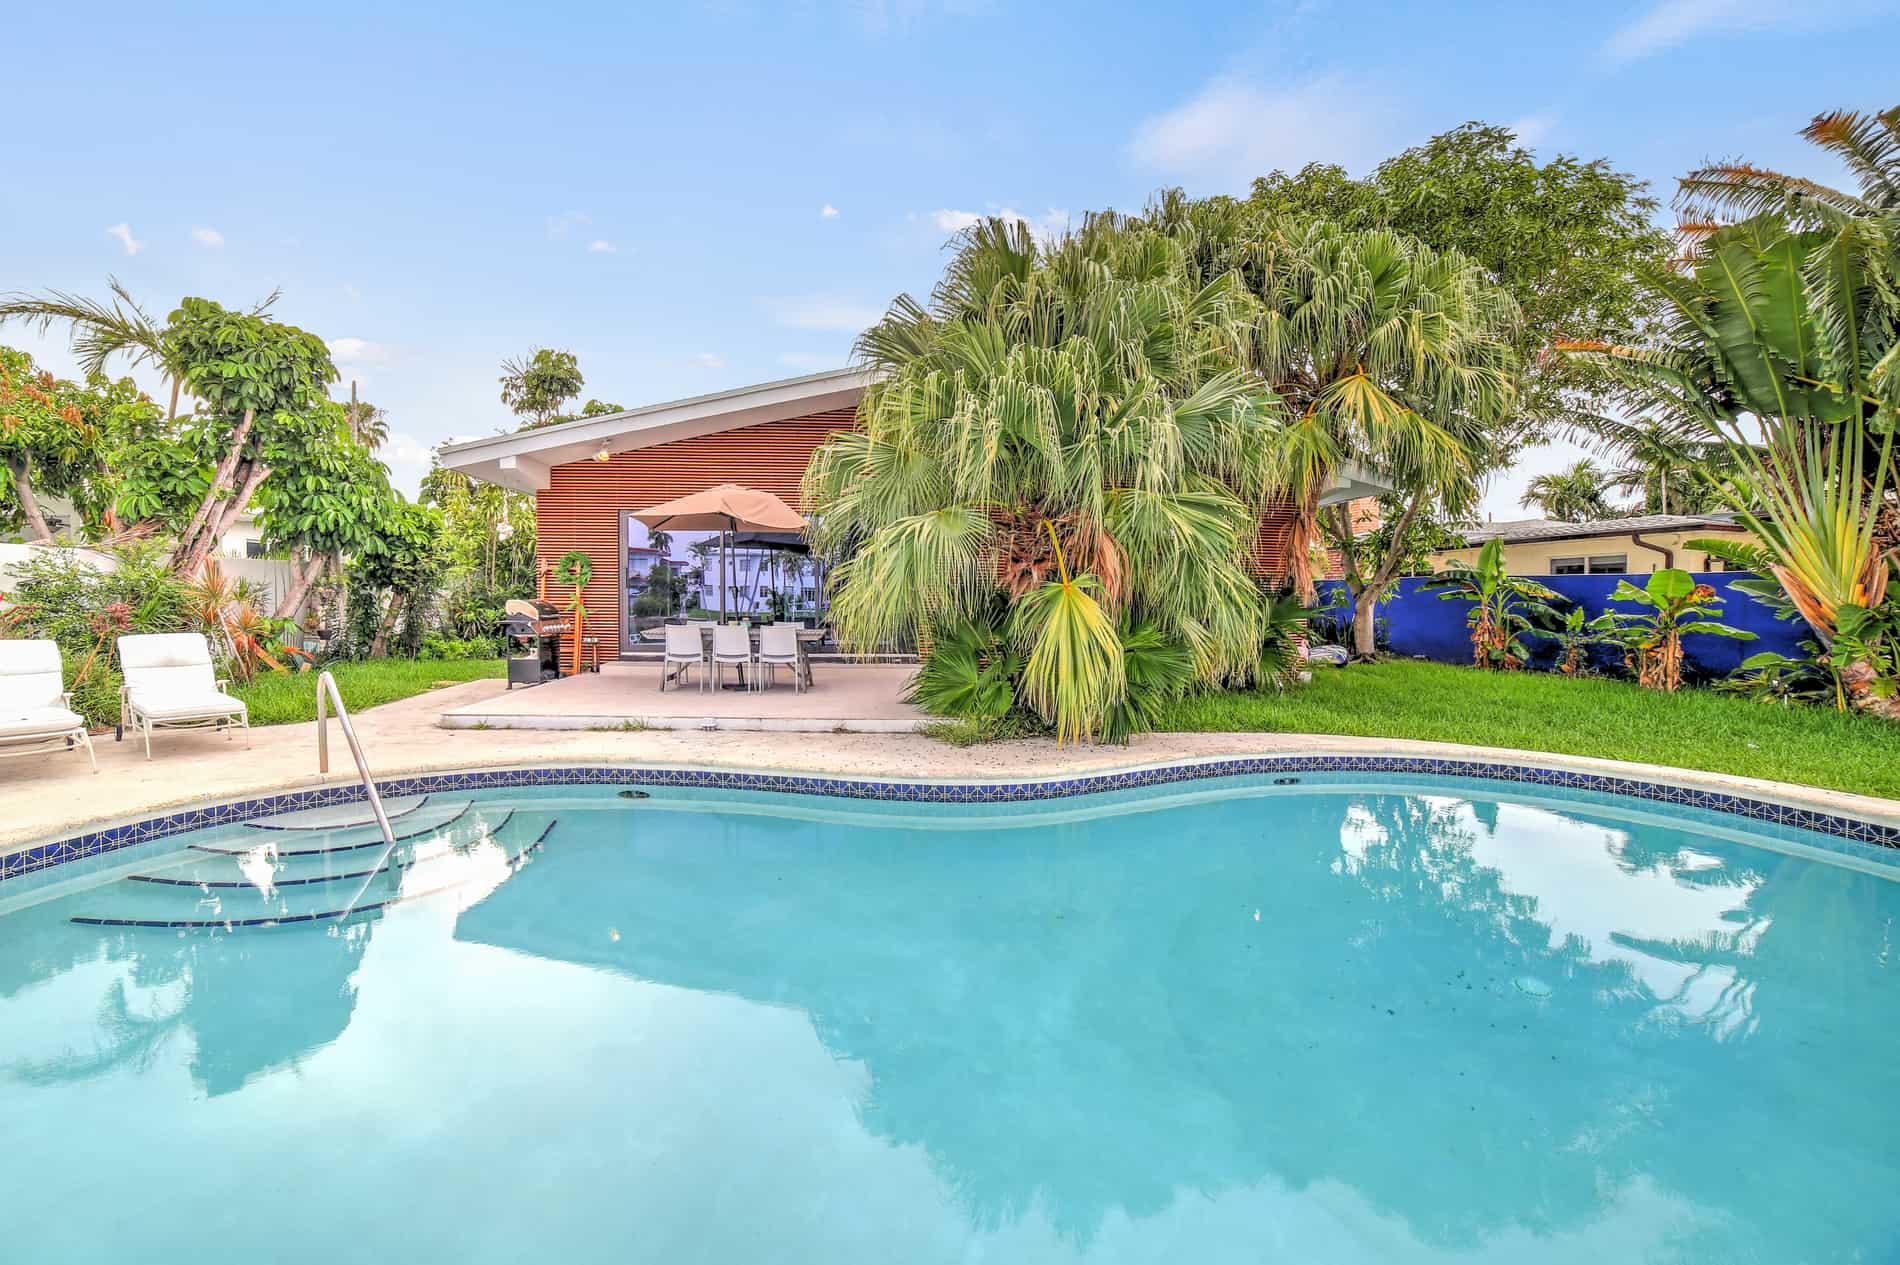 maison-a-vendre-miami-beach-piscine-garage-interieur